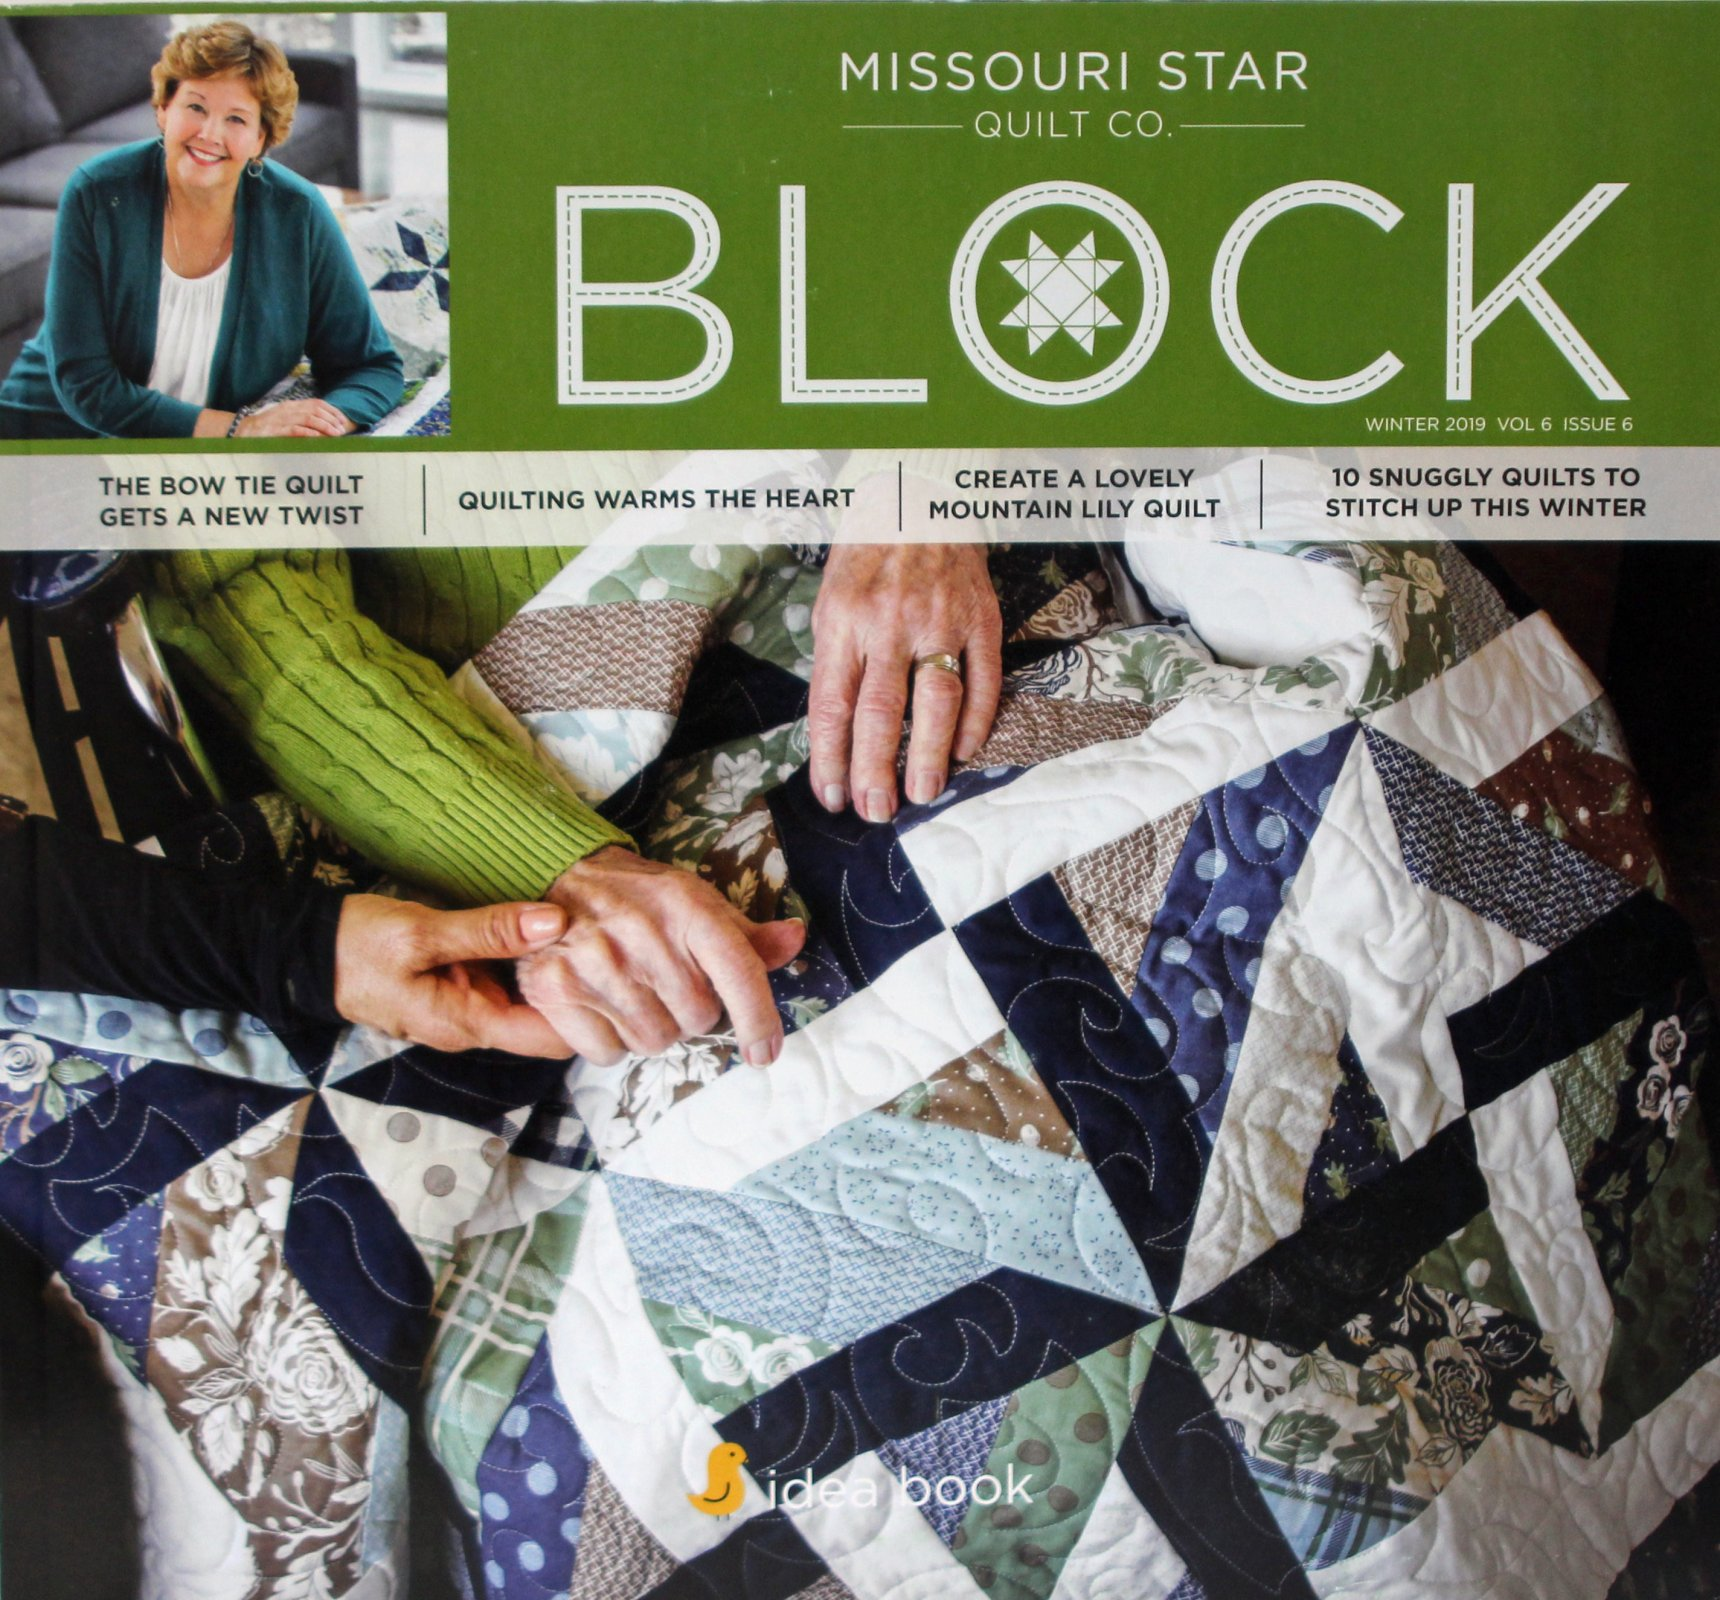 Block Winter 2019, vol. 6, issue 6